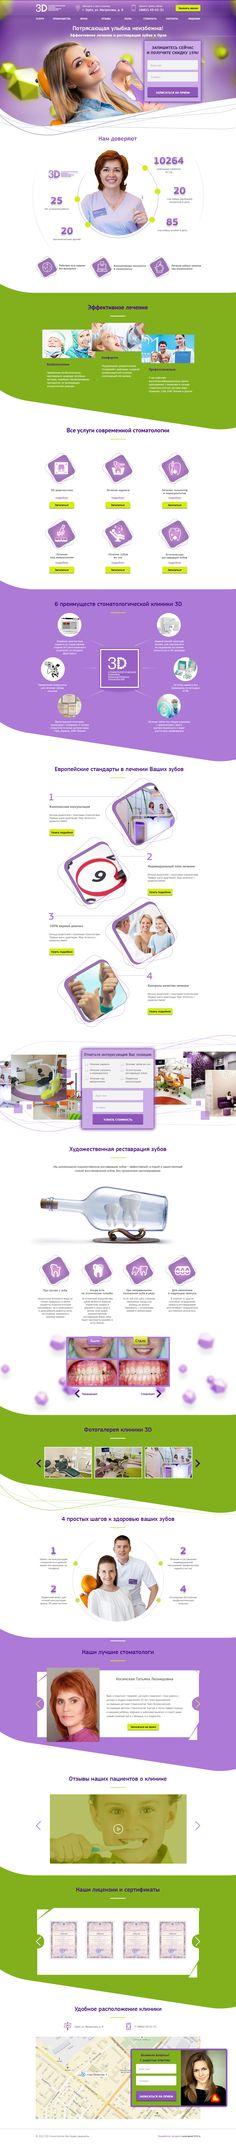 Ui Ux Design, Site Design, Web Layout, Psd Templates, Ecommerce, Medicine, Behance, Design Inspiration, Purple